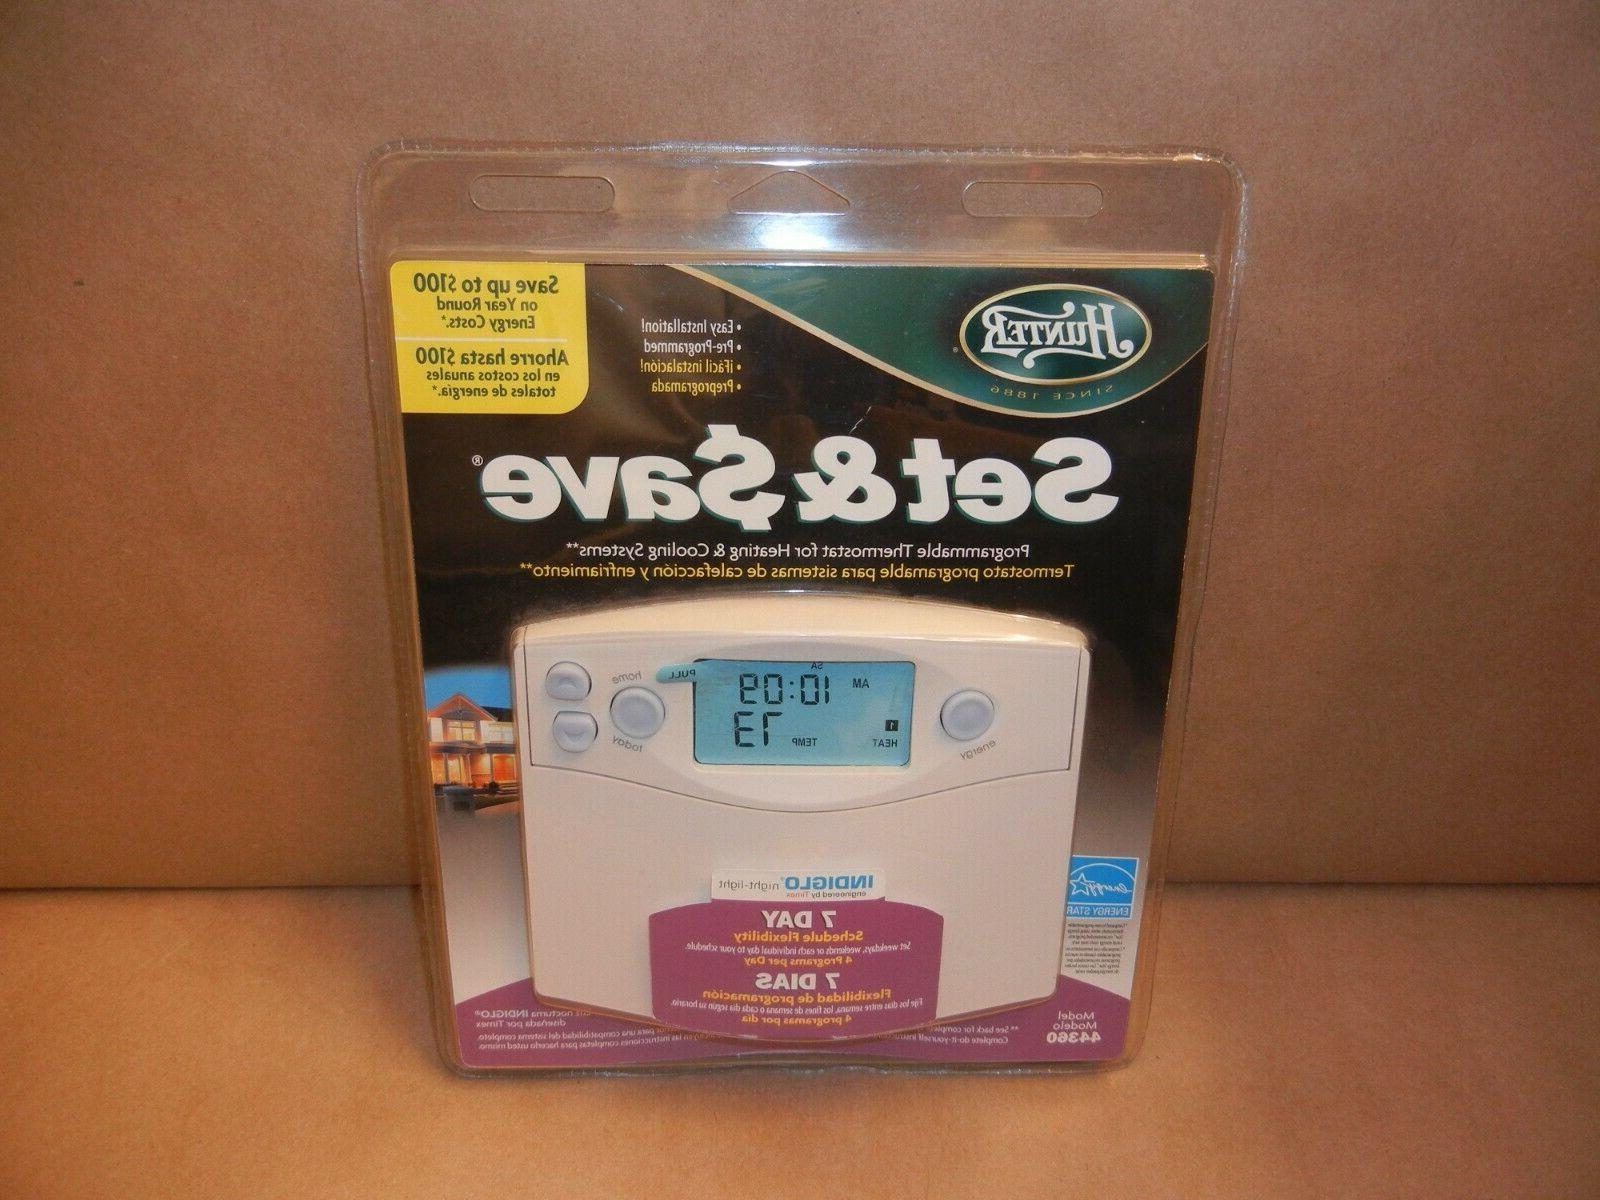 Hunter 44360 Set Save 7-Day Programmable Thermostat